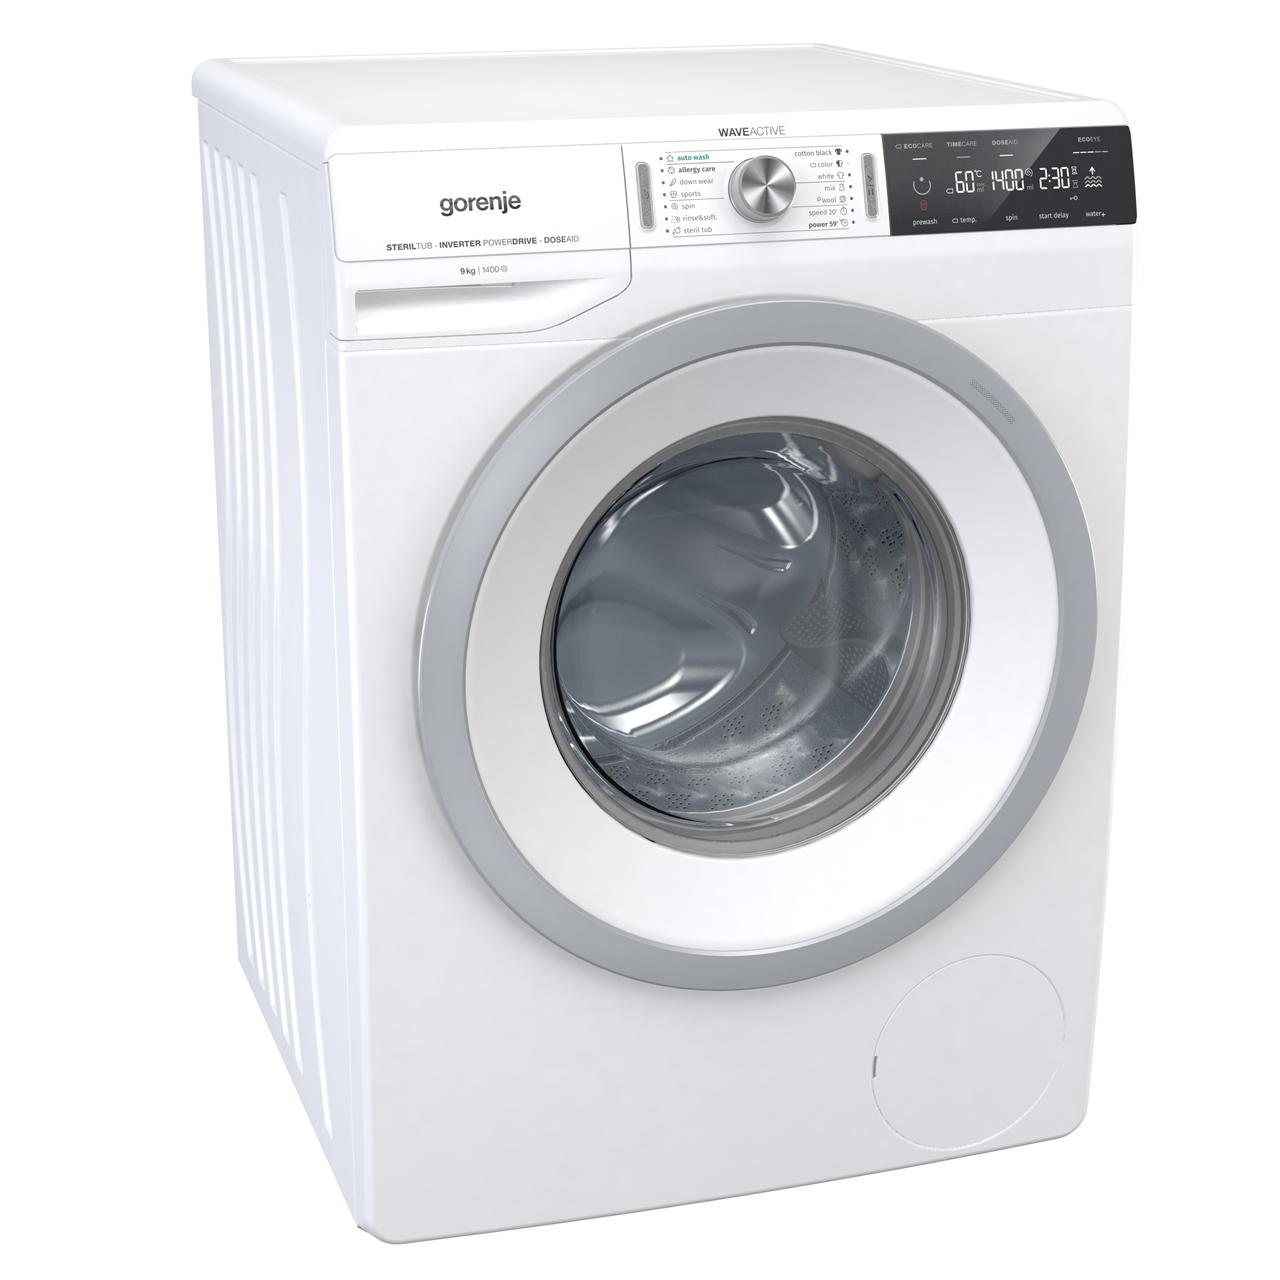 Gorenje Waveactive Wa946 9kg Washing Machine With 1400 Rpm